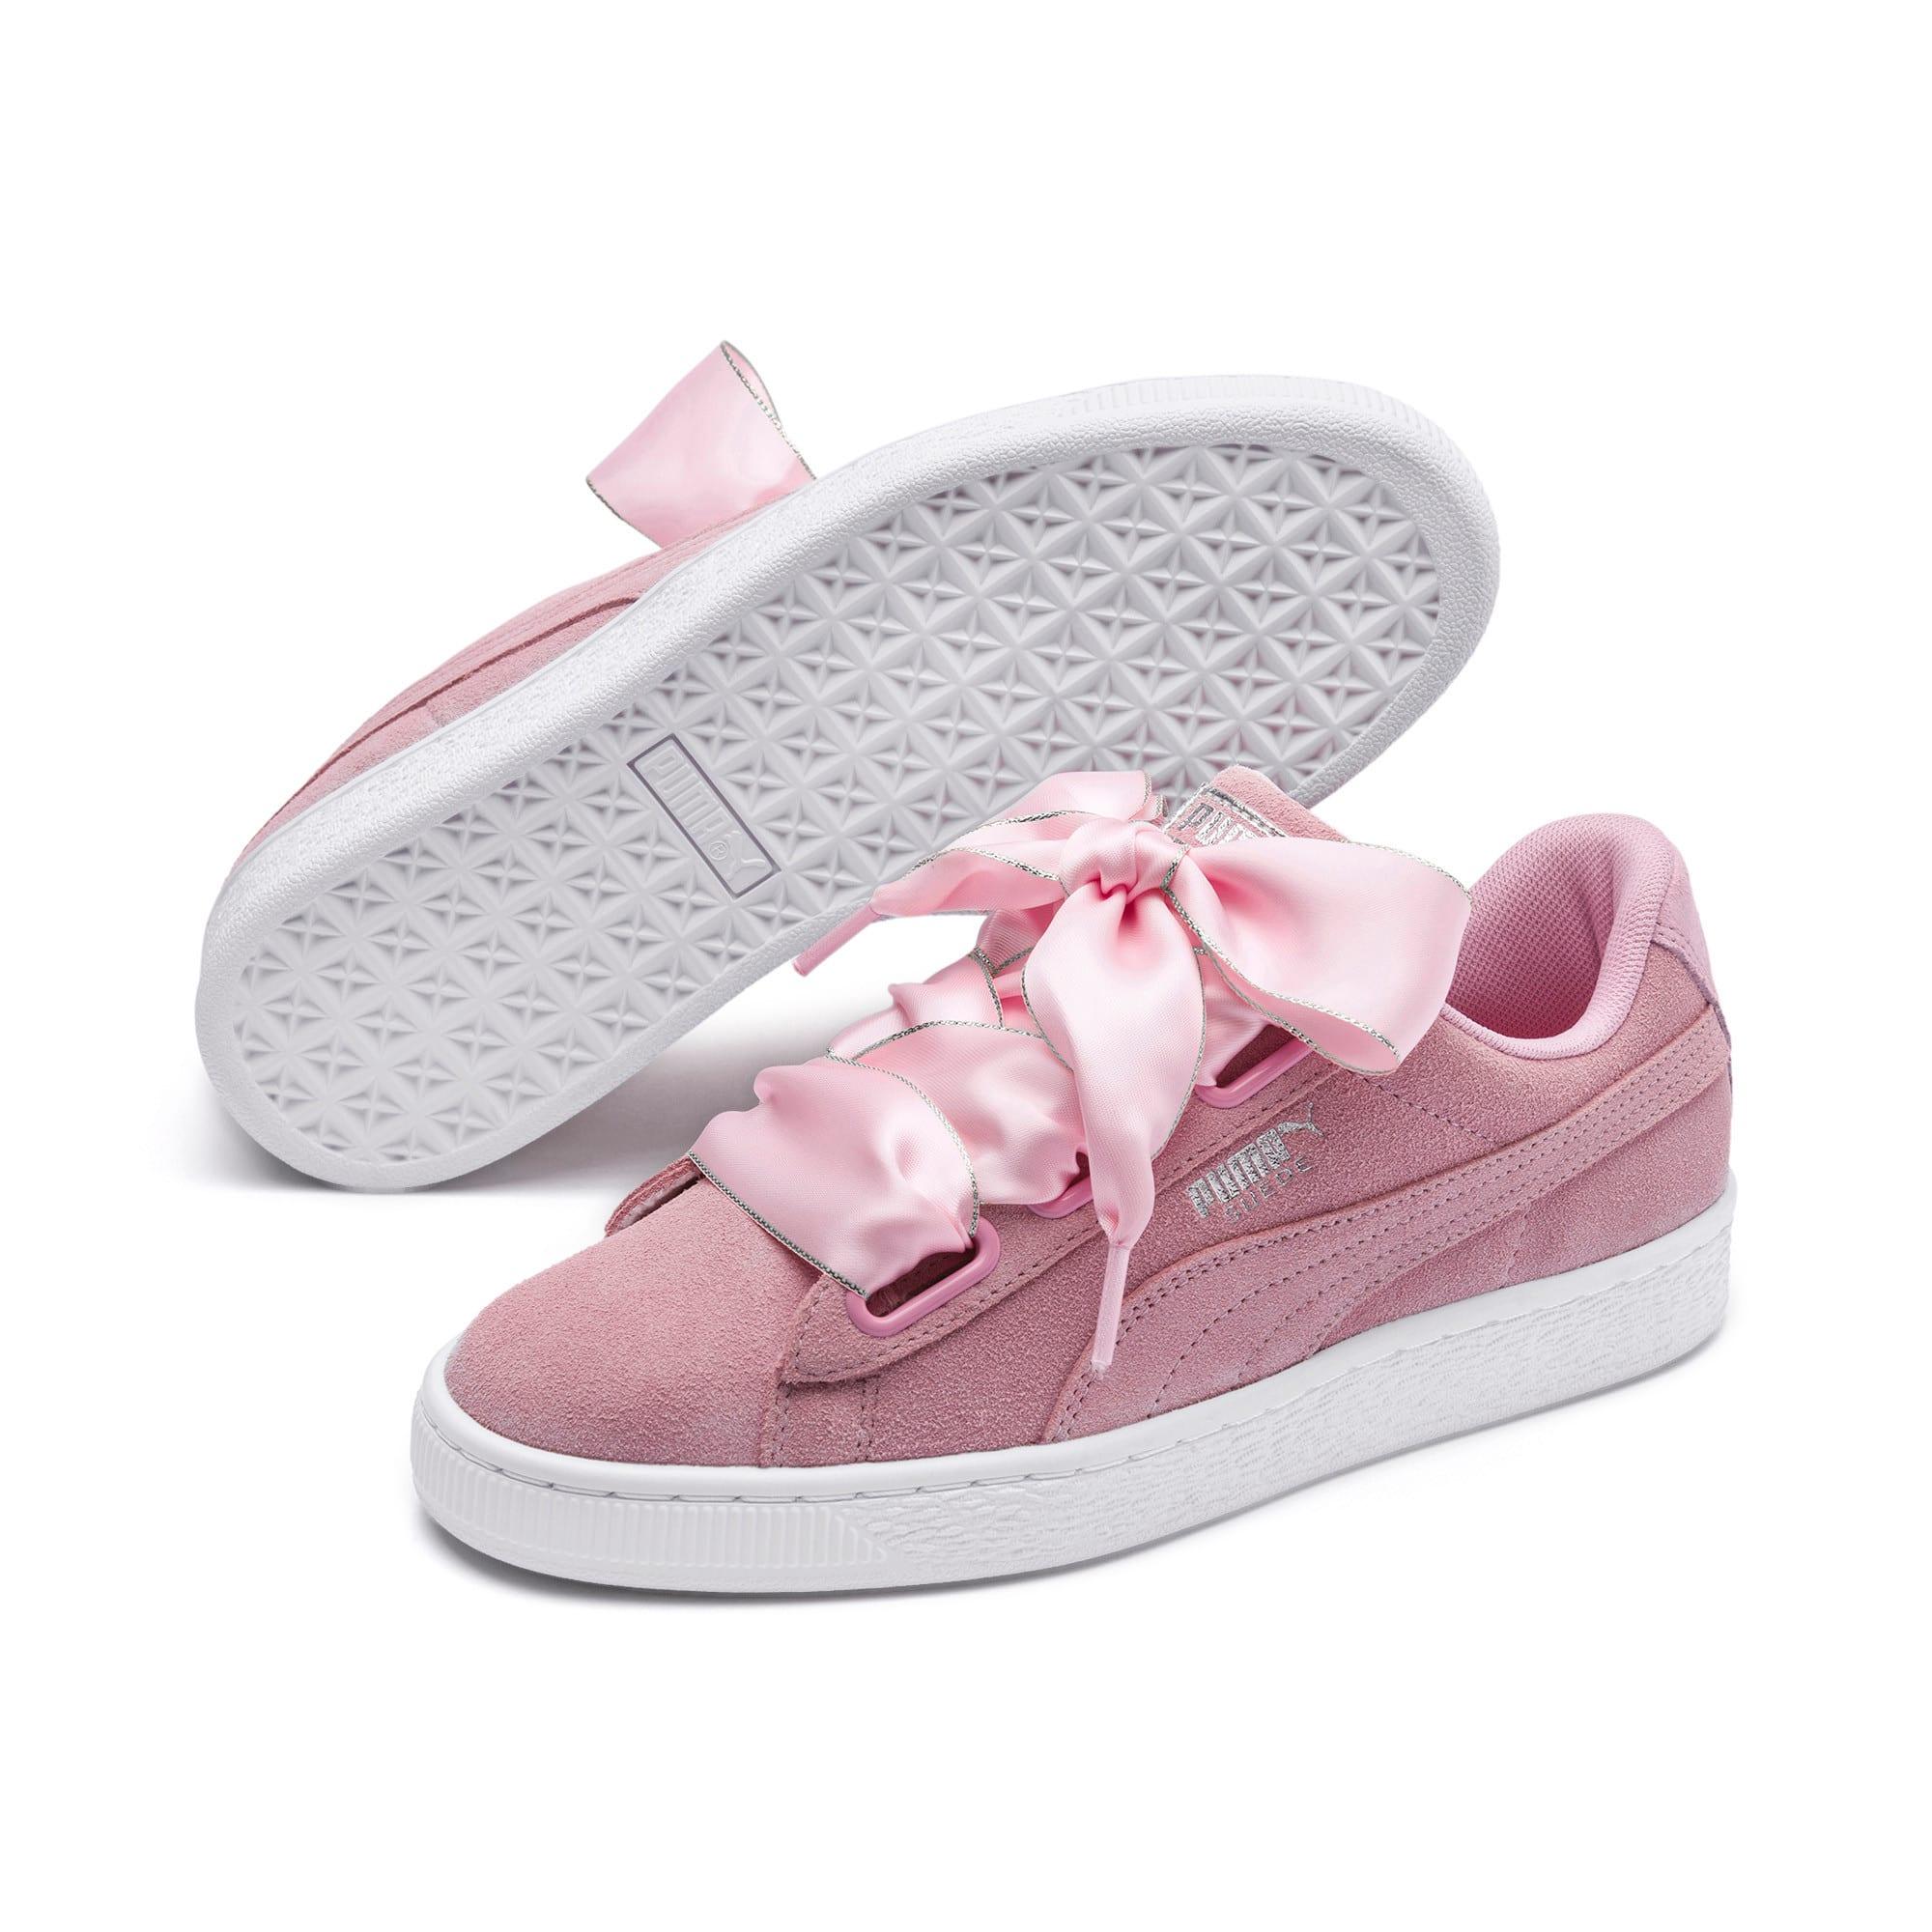 innovative design 7d652 7ce2d Suede Heart Galaxy Women's Sneakers